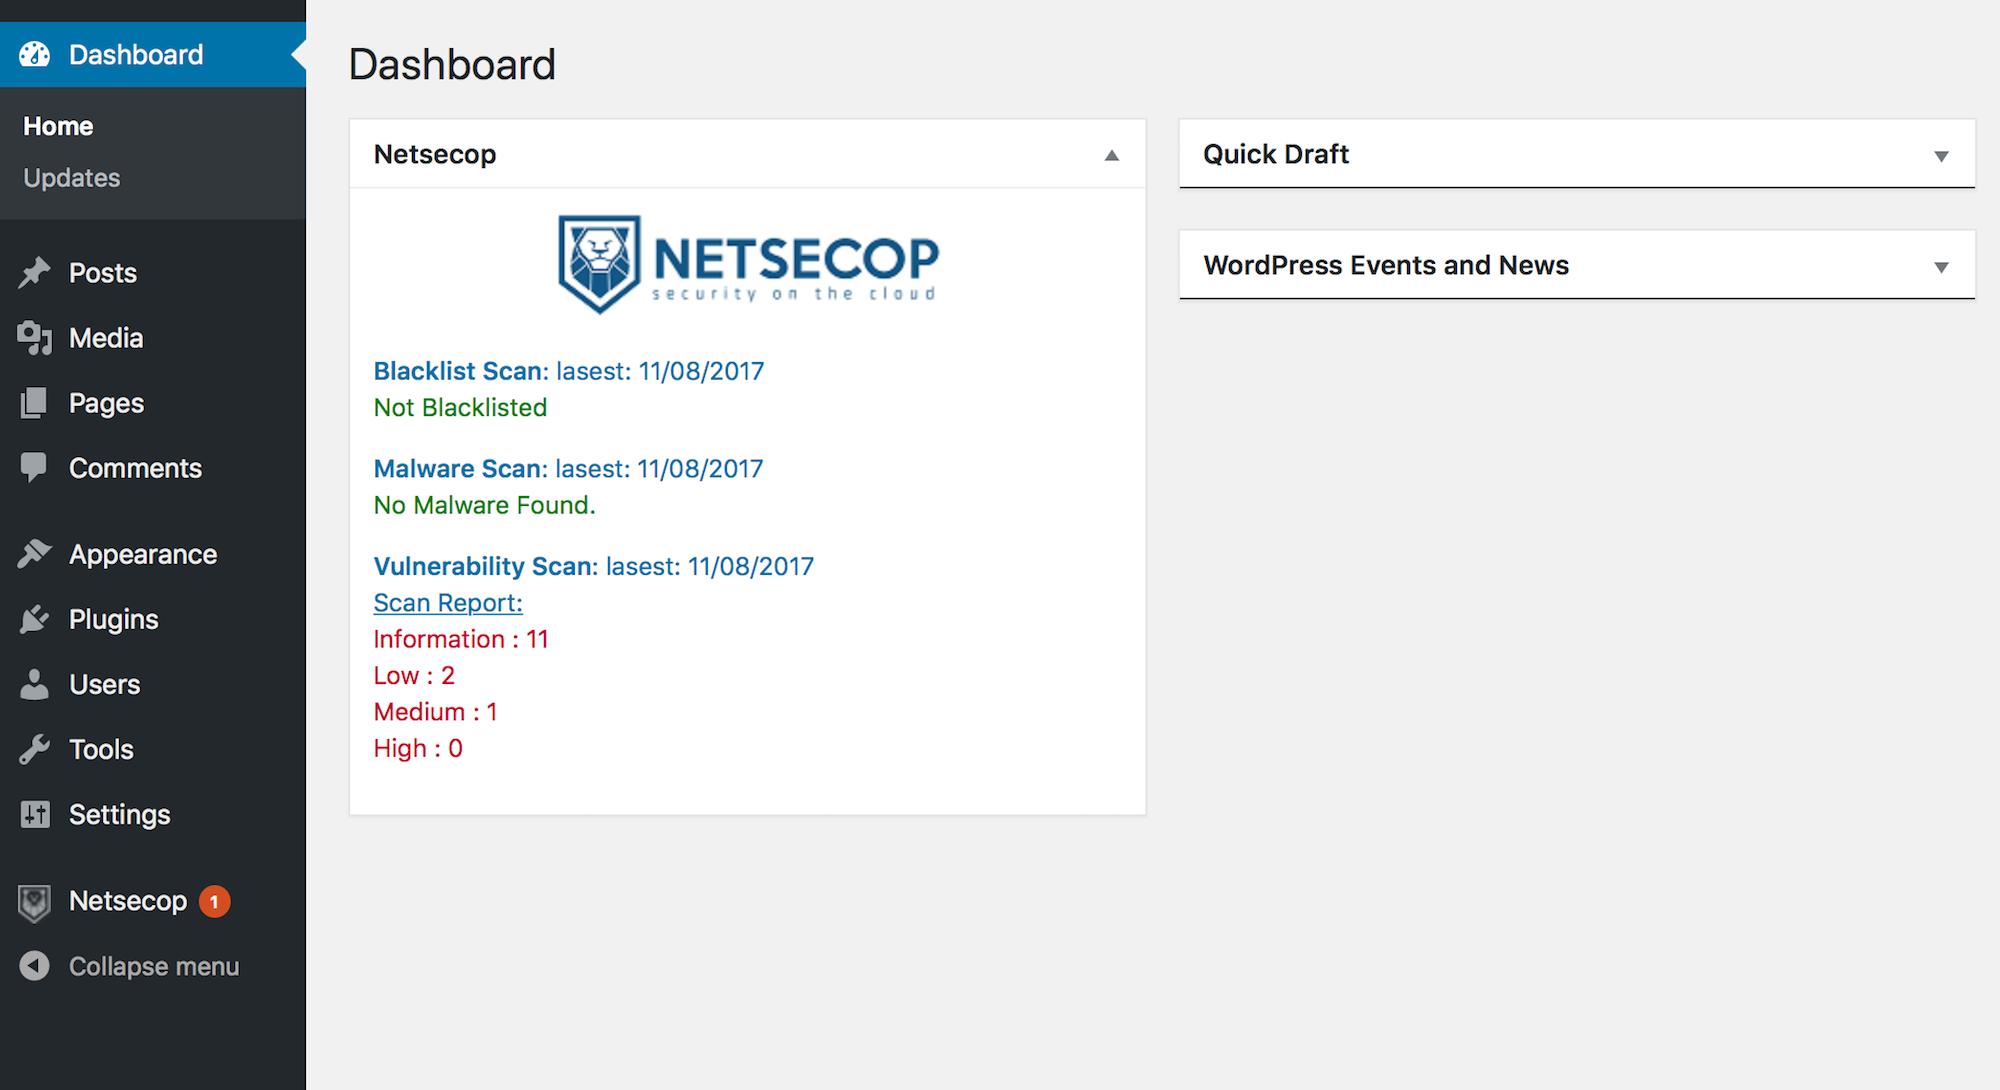 Netsecop Dashboard Widget